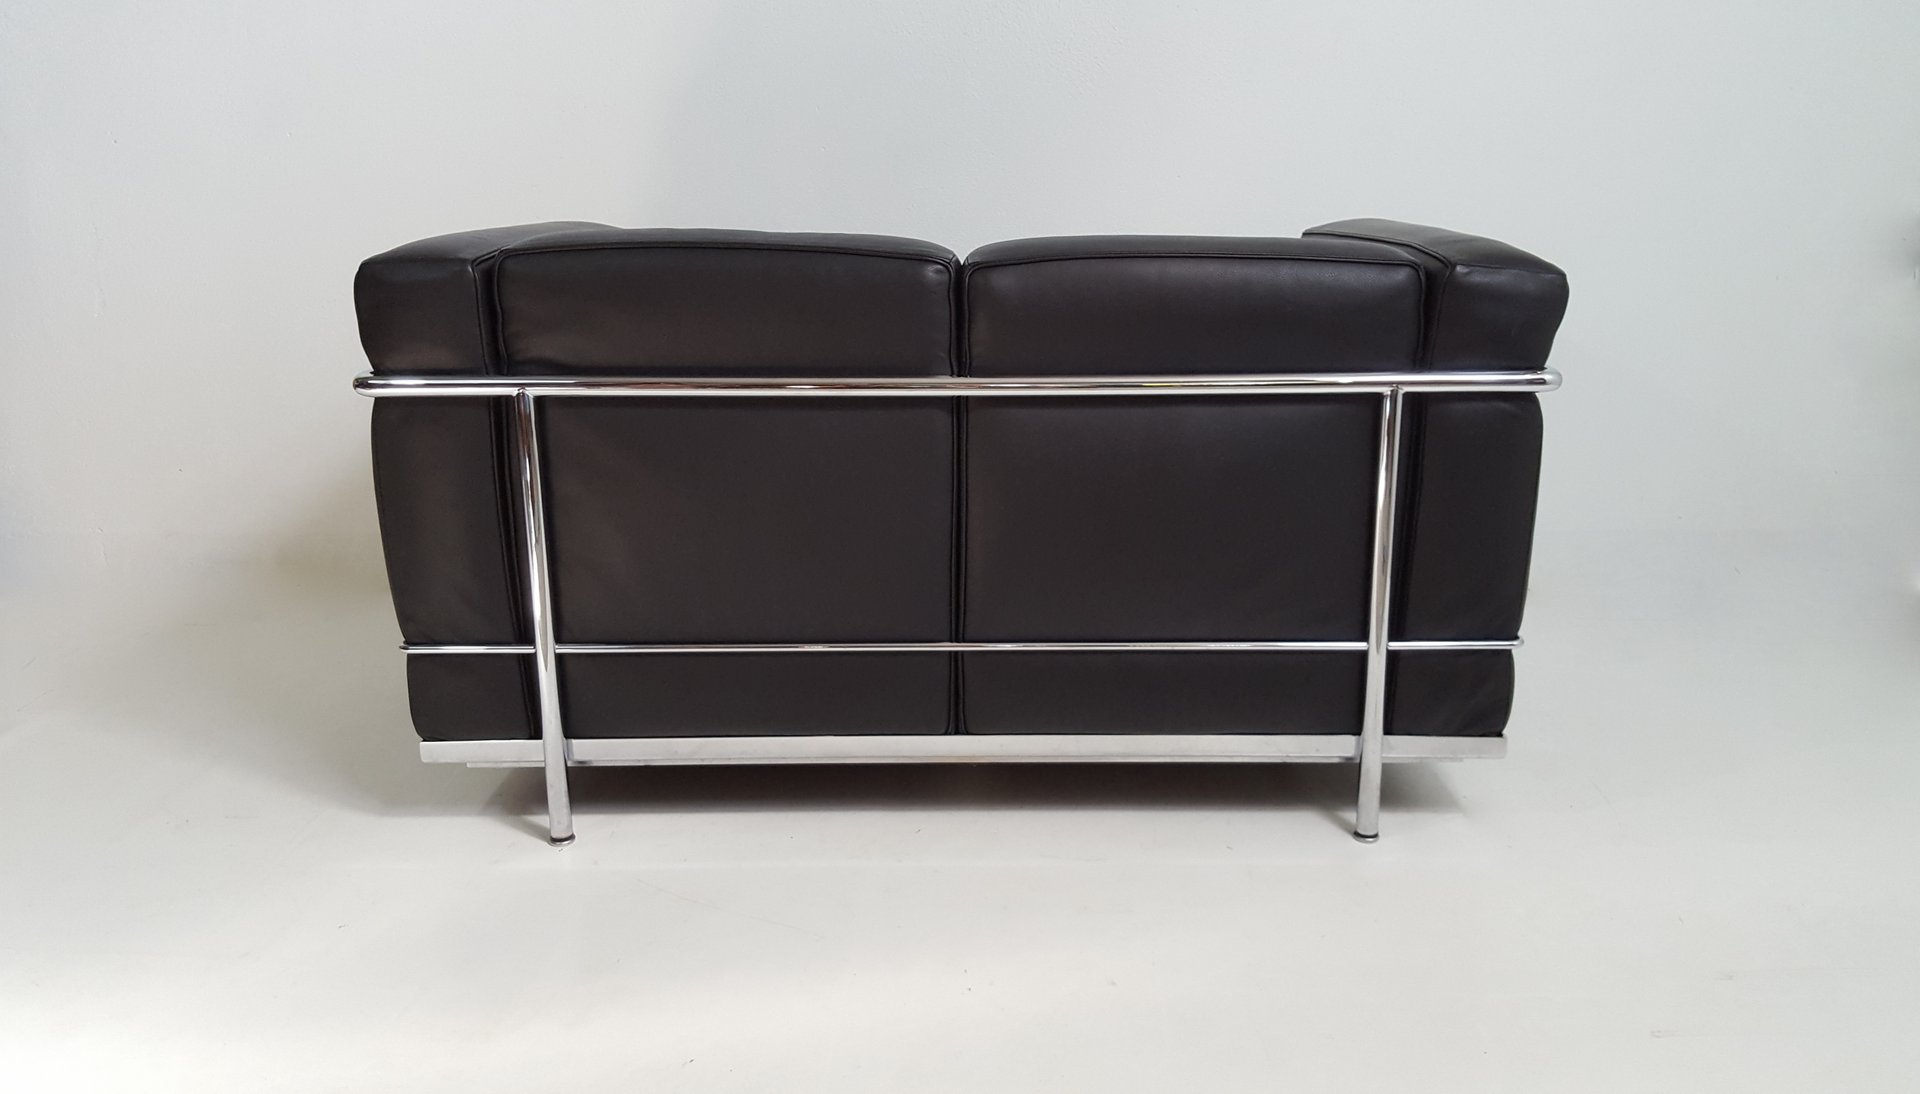 schwarzes vintage lc2 ledersofa von le corbusier f r cassina bei pamono kaufen. Black Bedroom Furniture Sets. Home Design Ideas